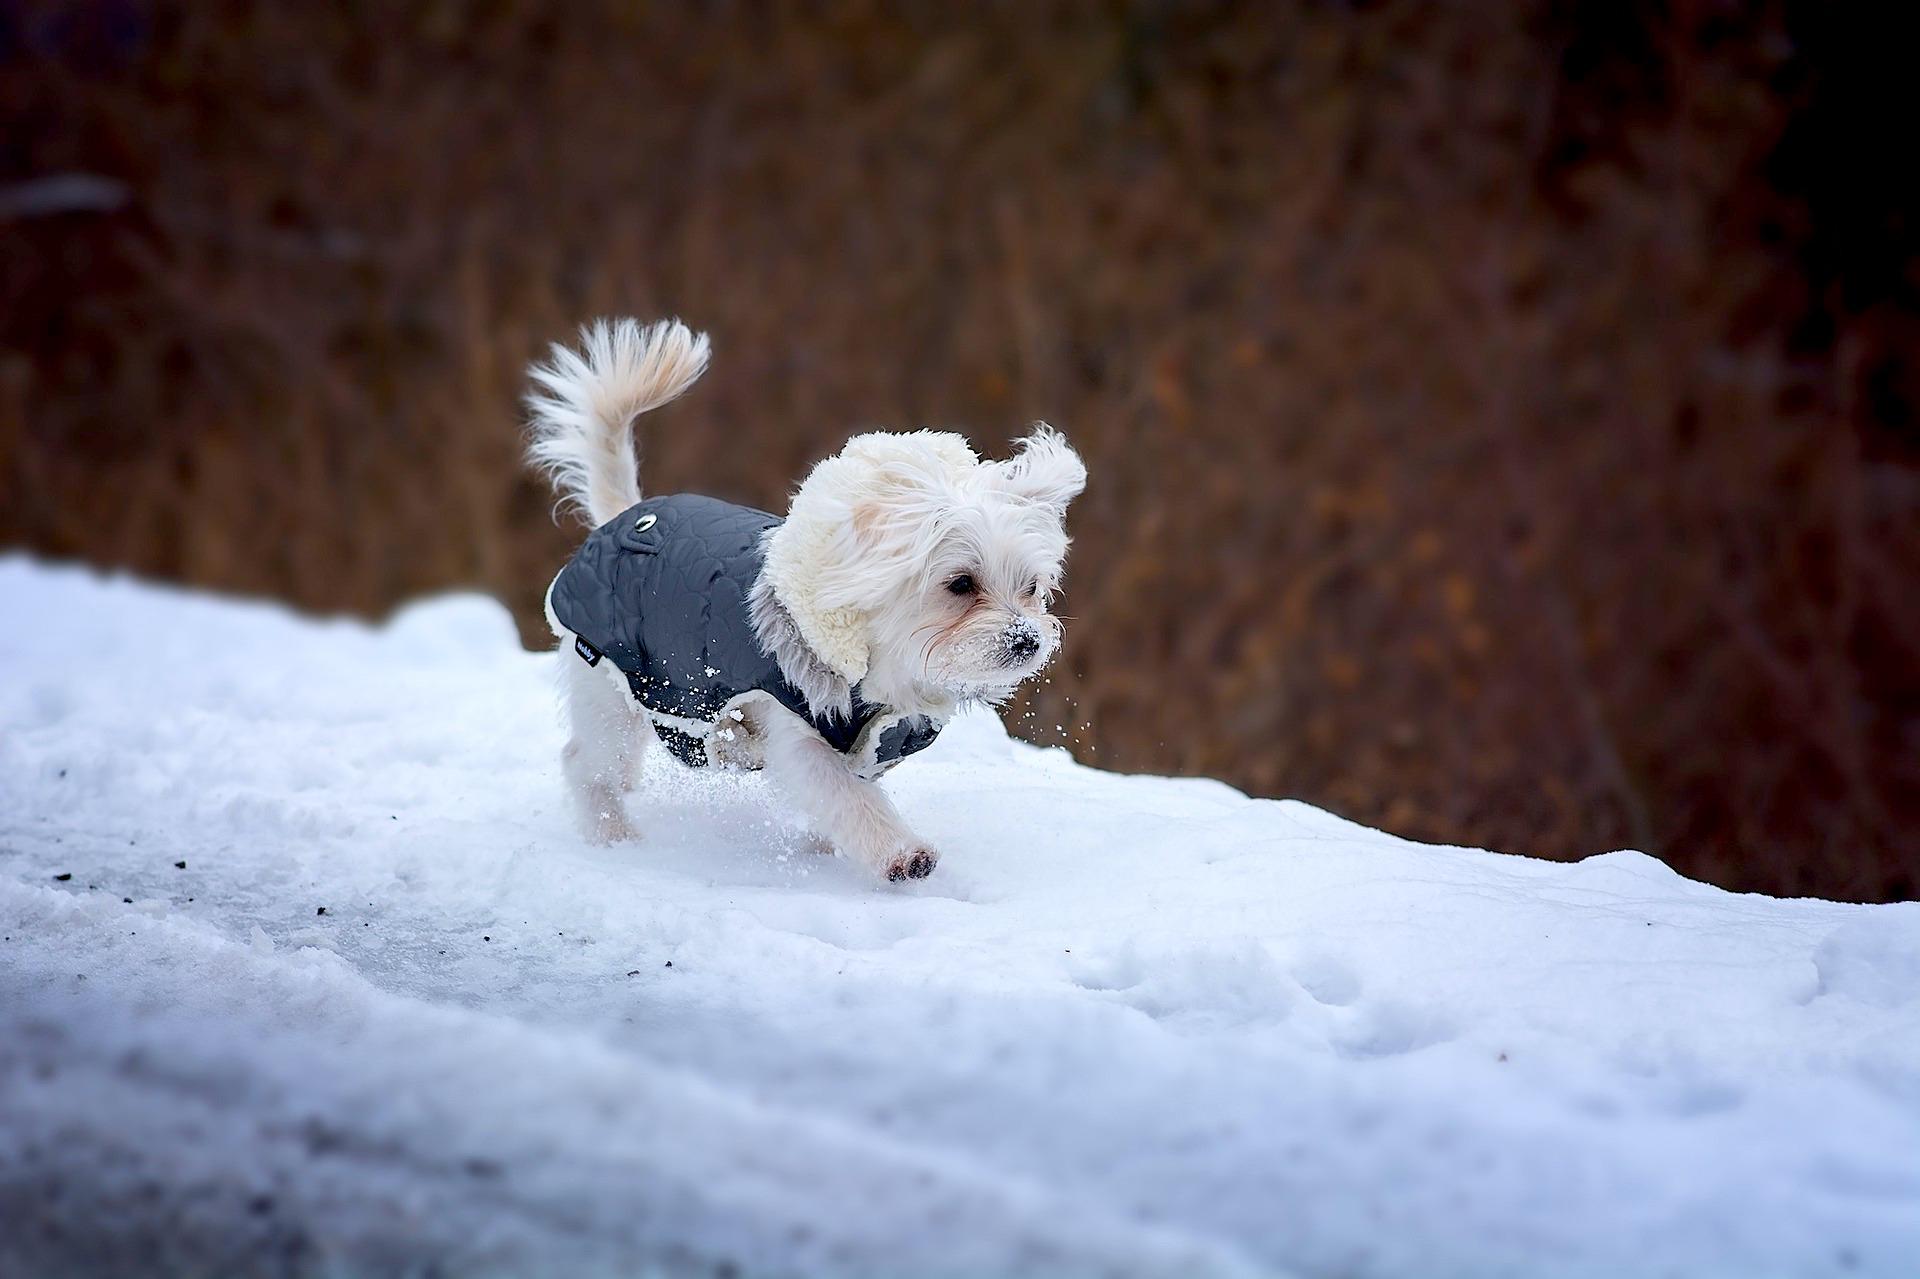 Dapper little gent in the snow